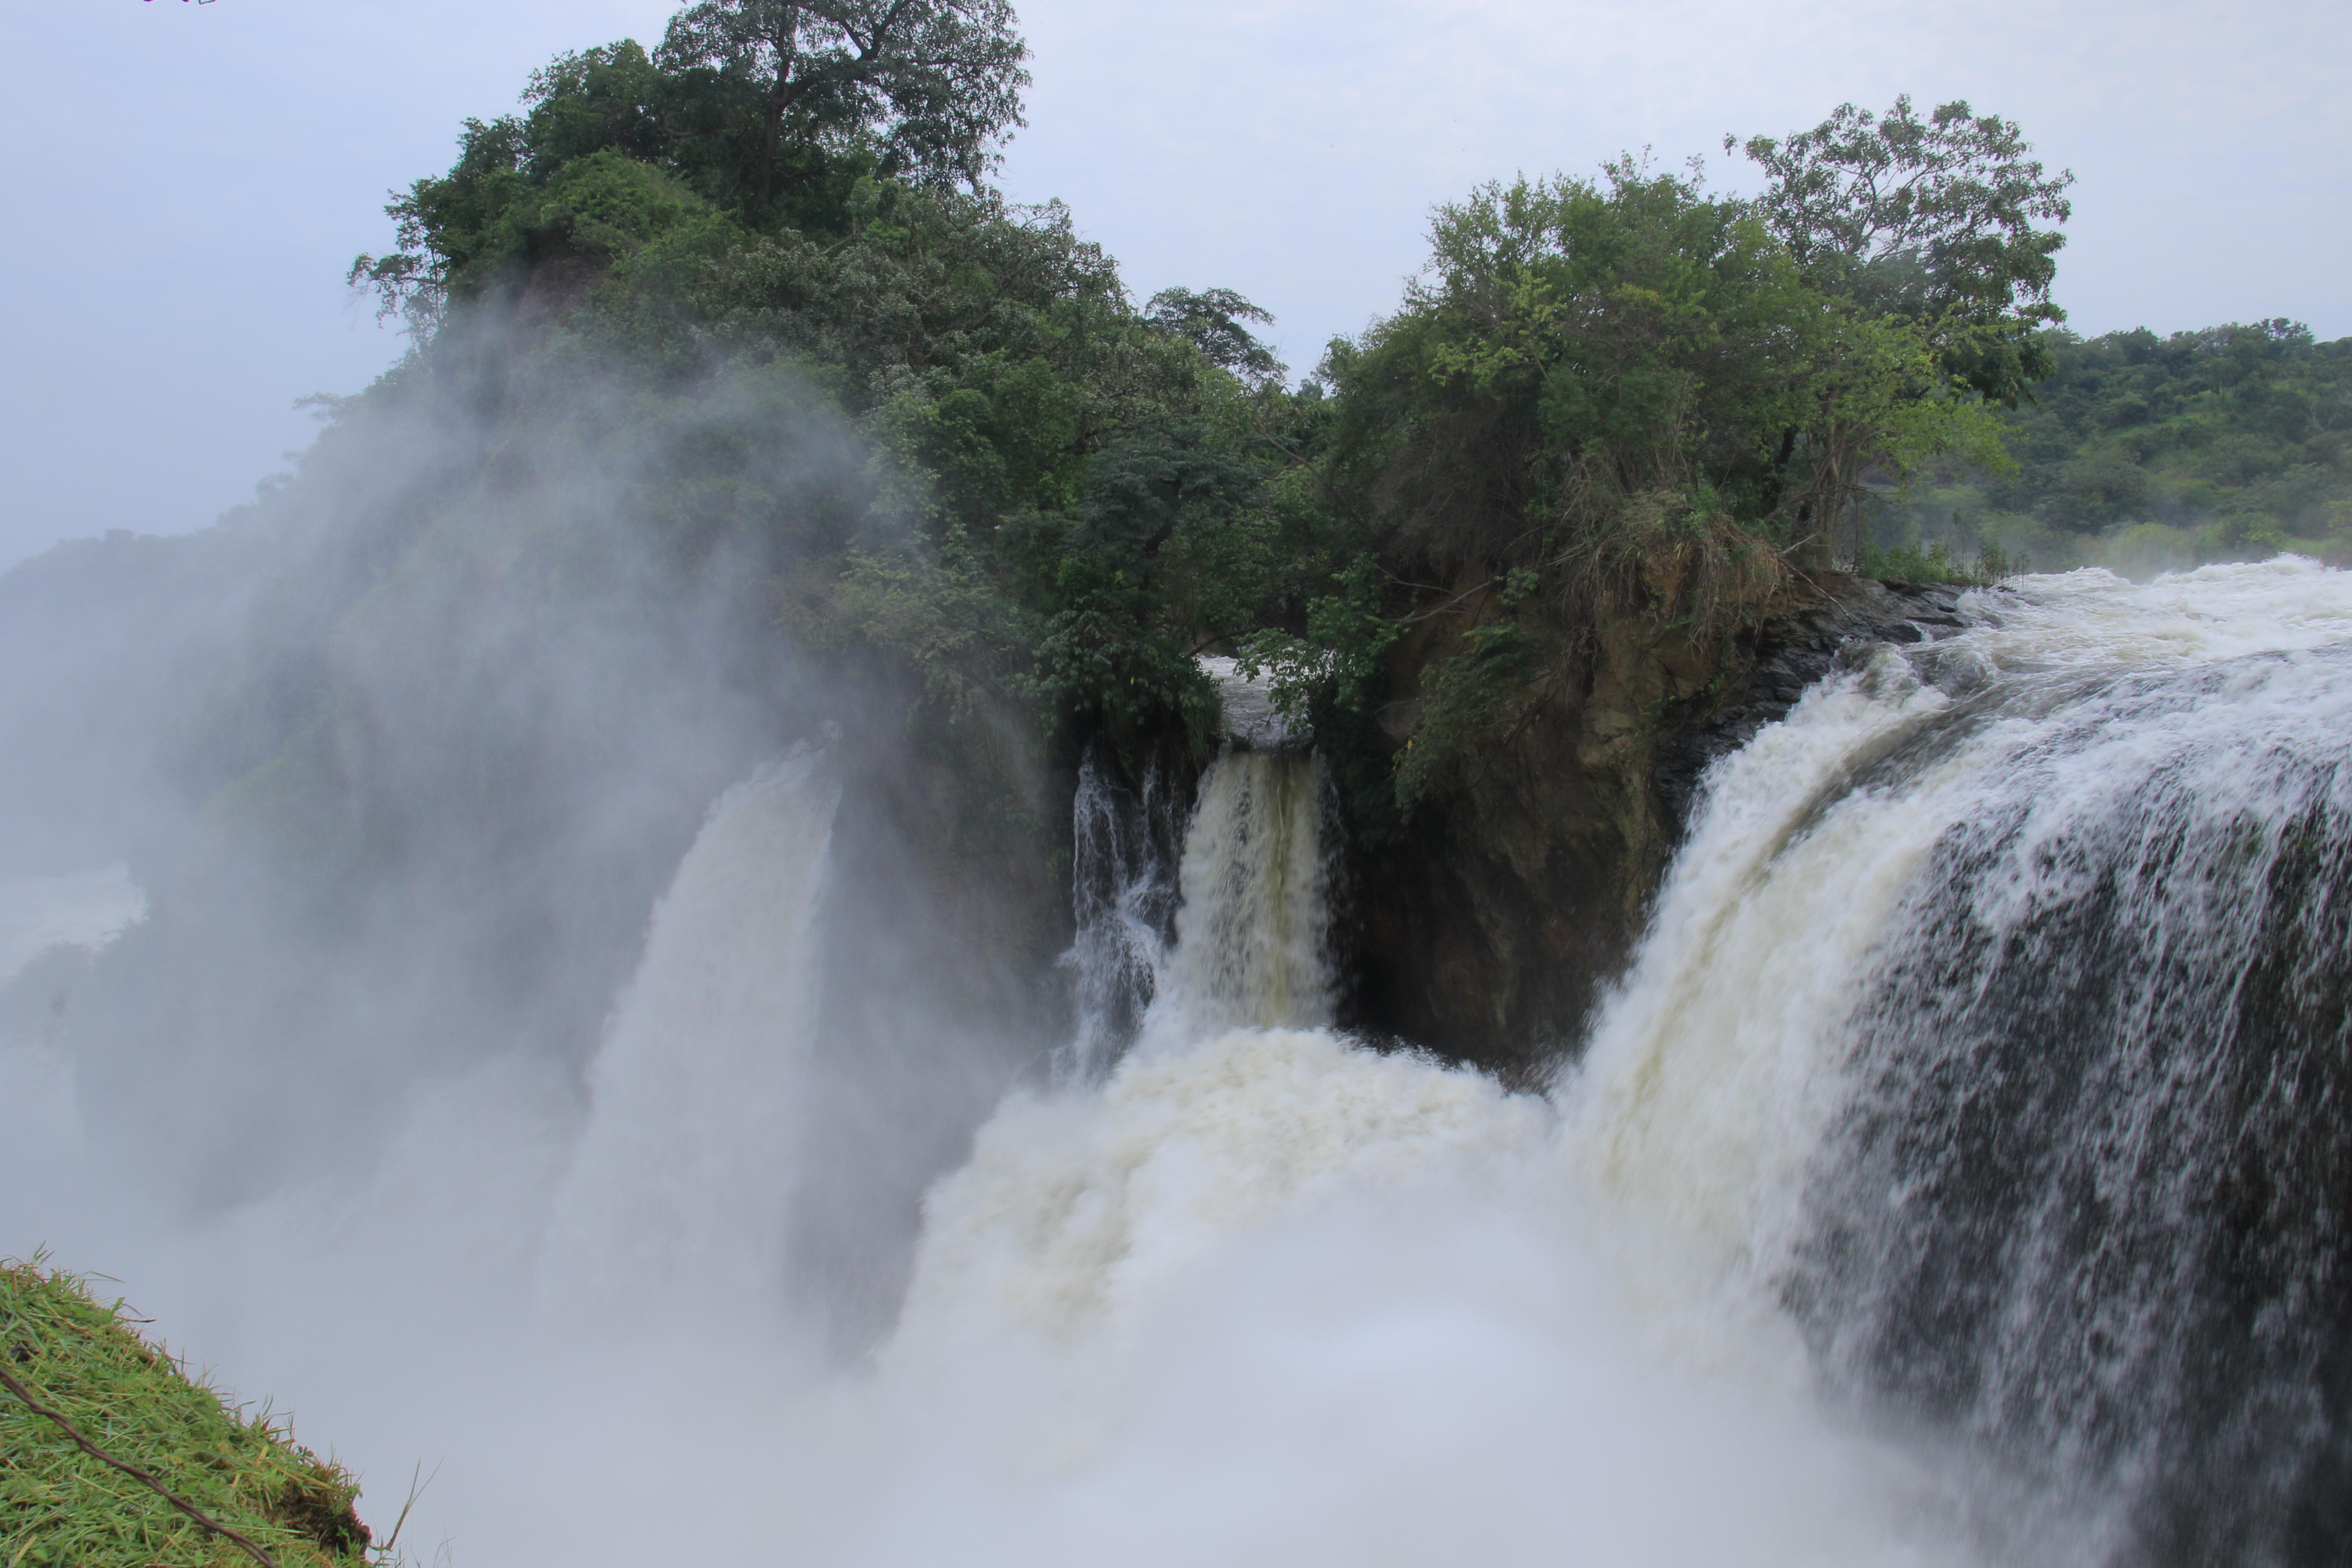 10 Days Road Trip to Encounter Gorillas & Wildlife in Uganda Tour 4